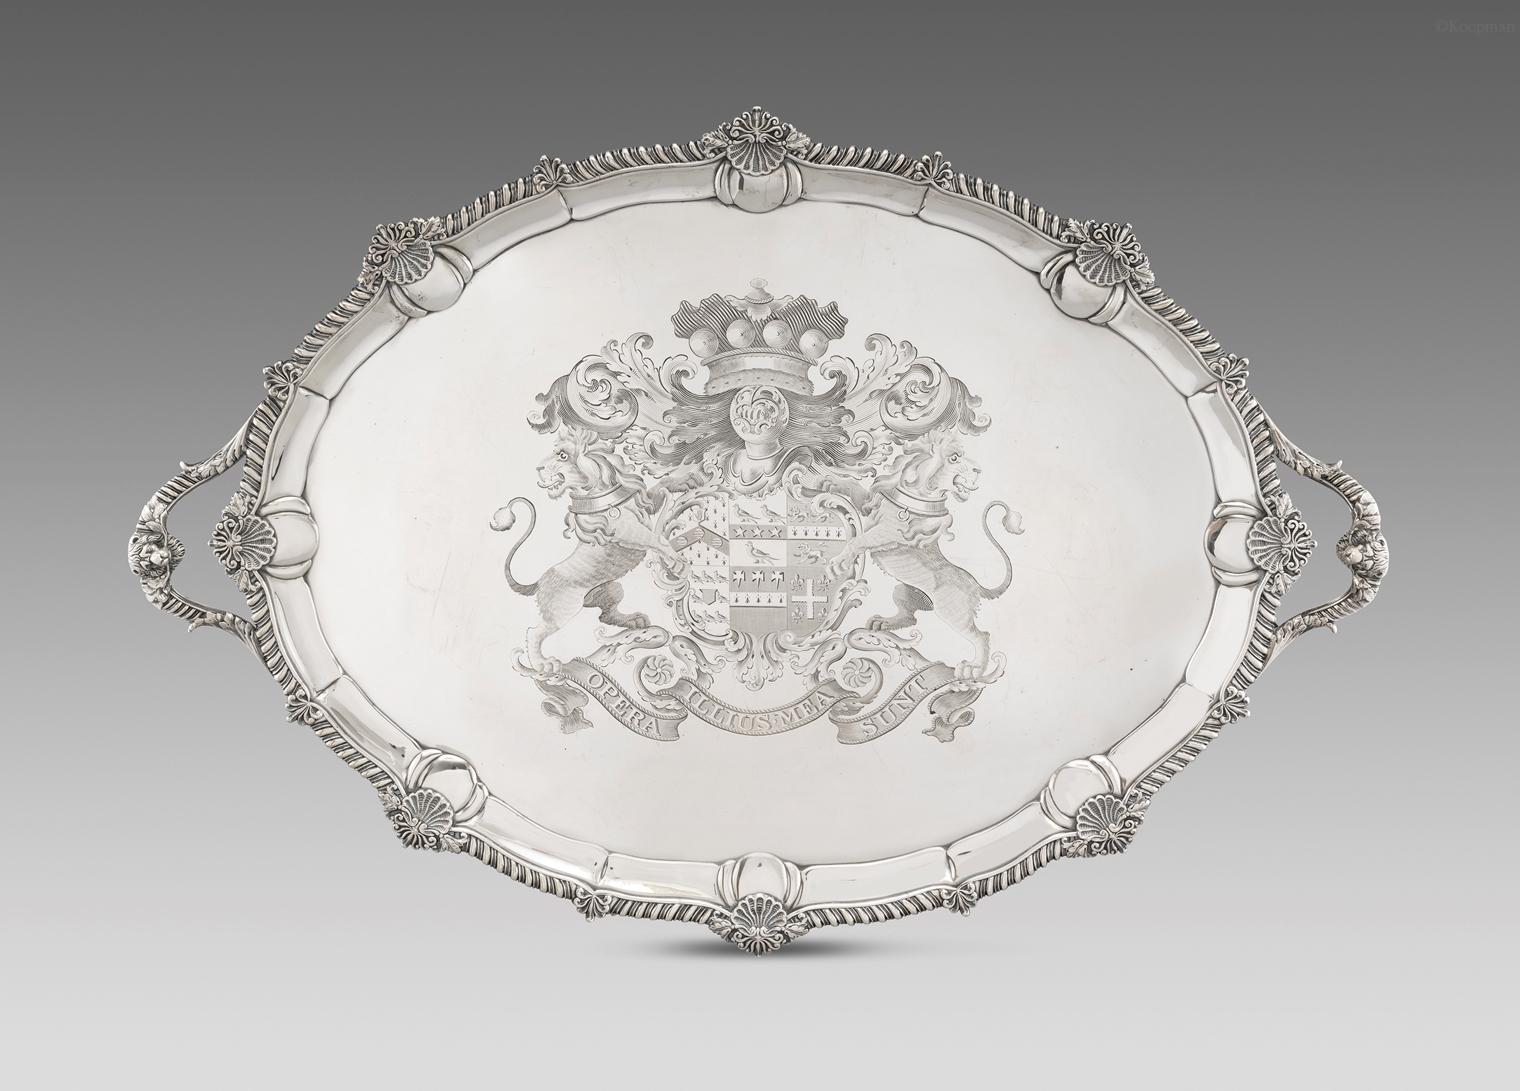 An Ornate George III Tray